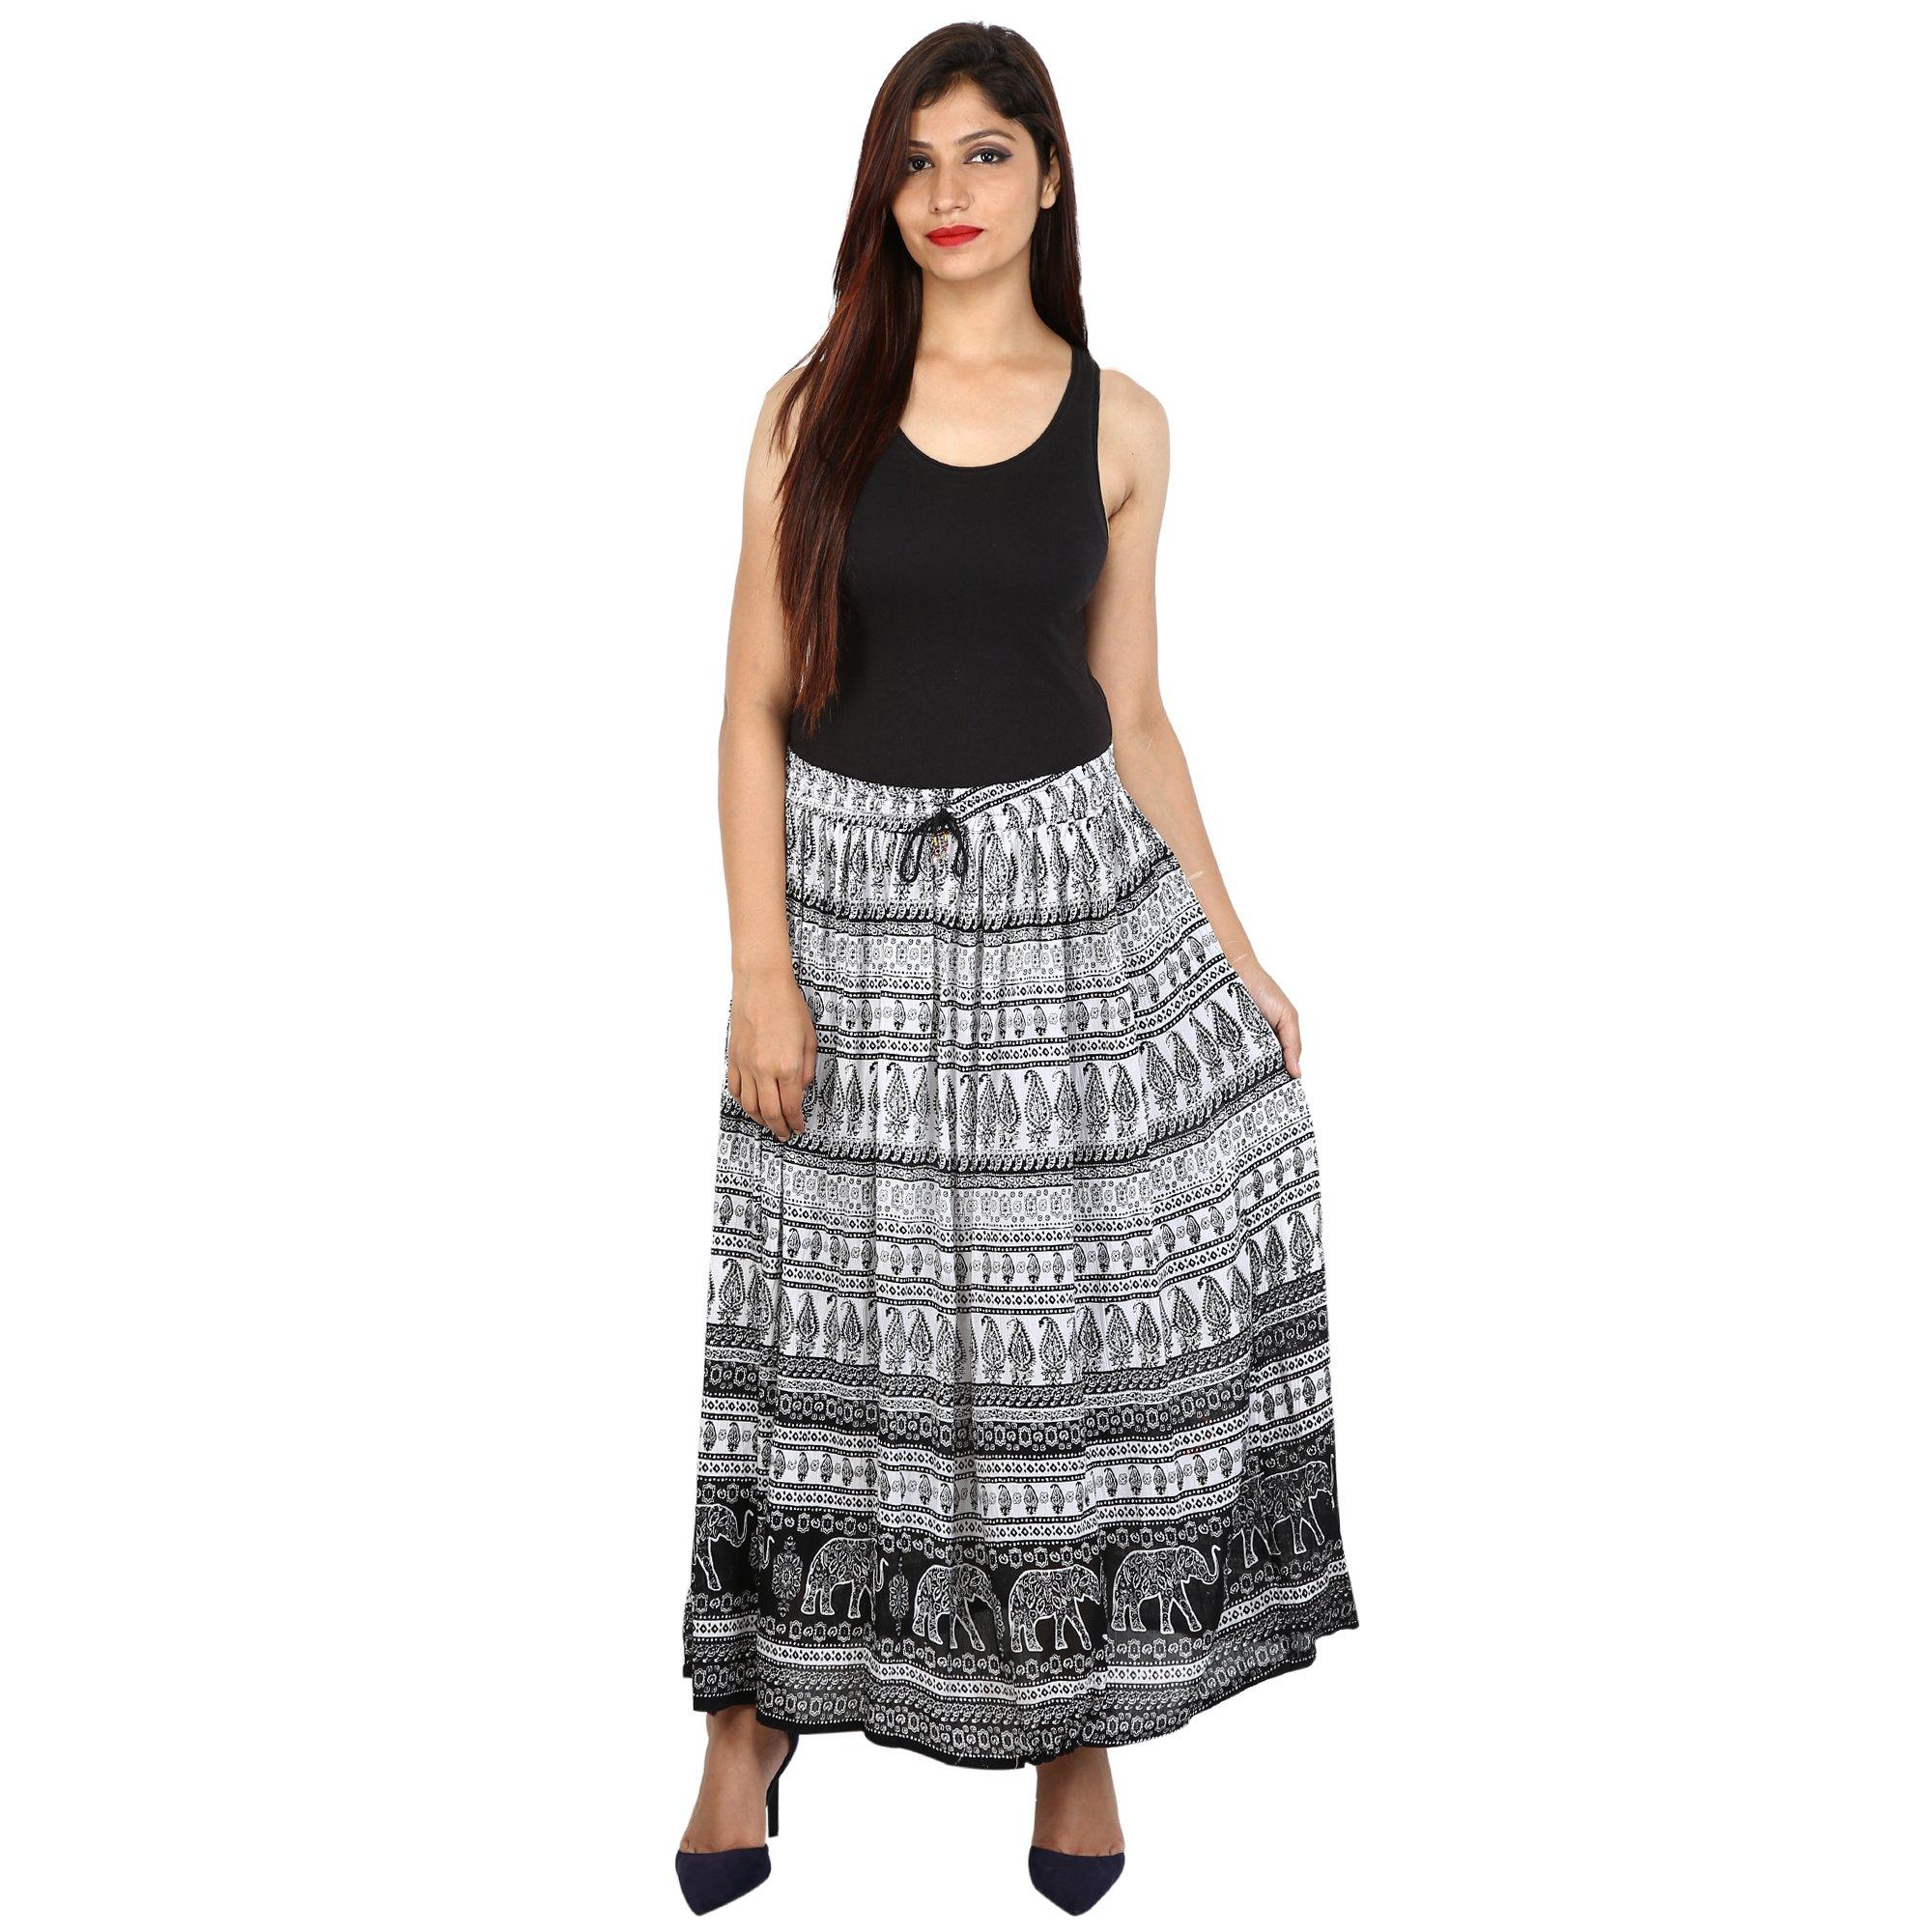 Shree Ram Impex Women's Jaipuri Rayon Skirt Ankle Length 36 Inches (Black & White)